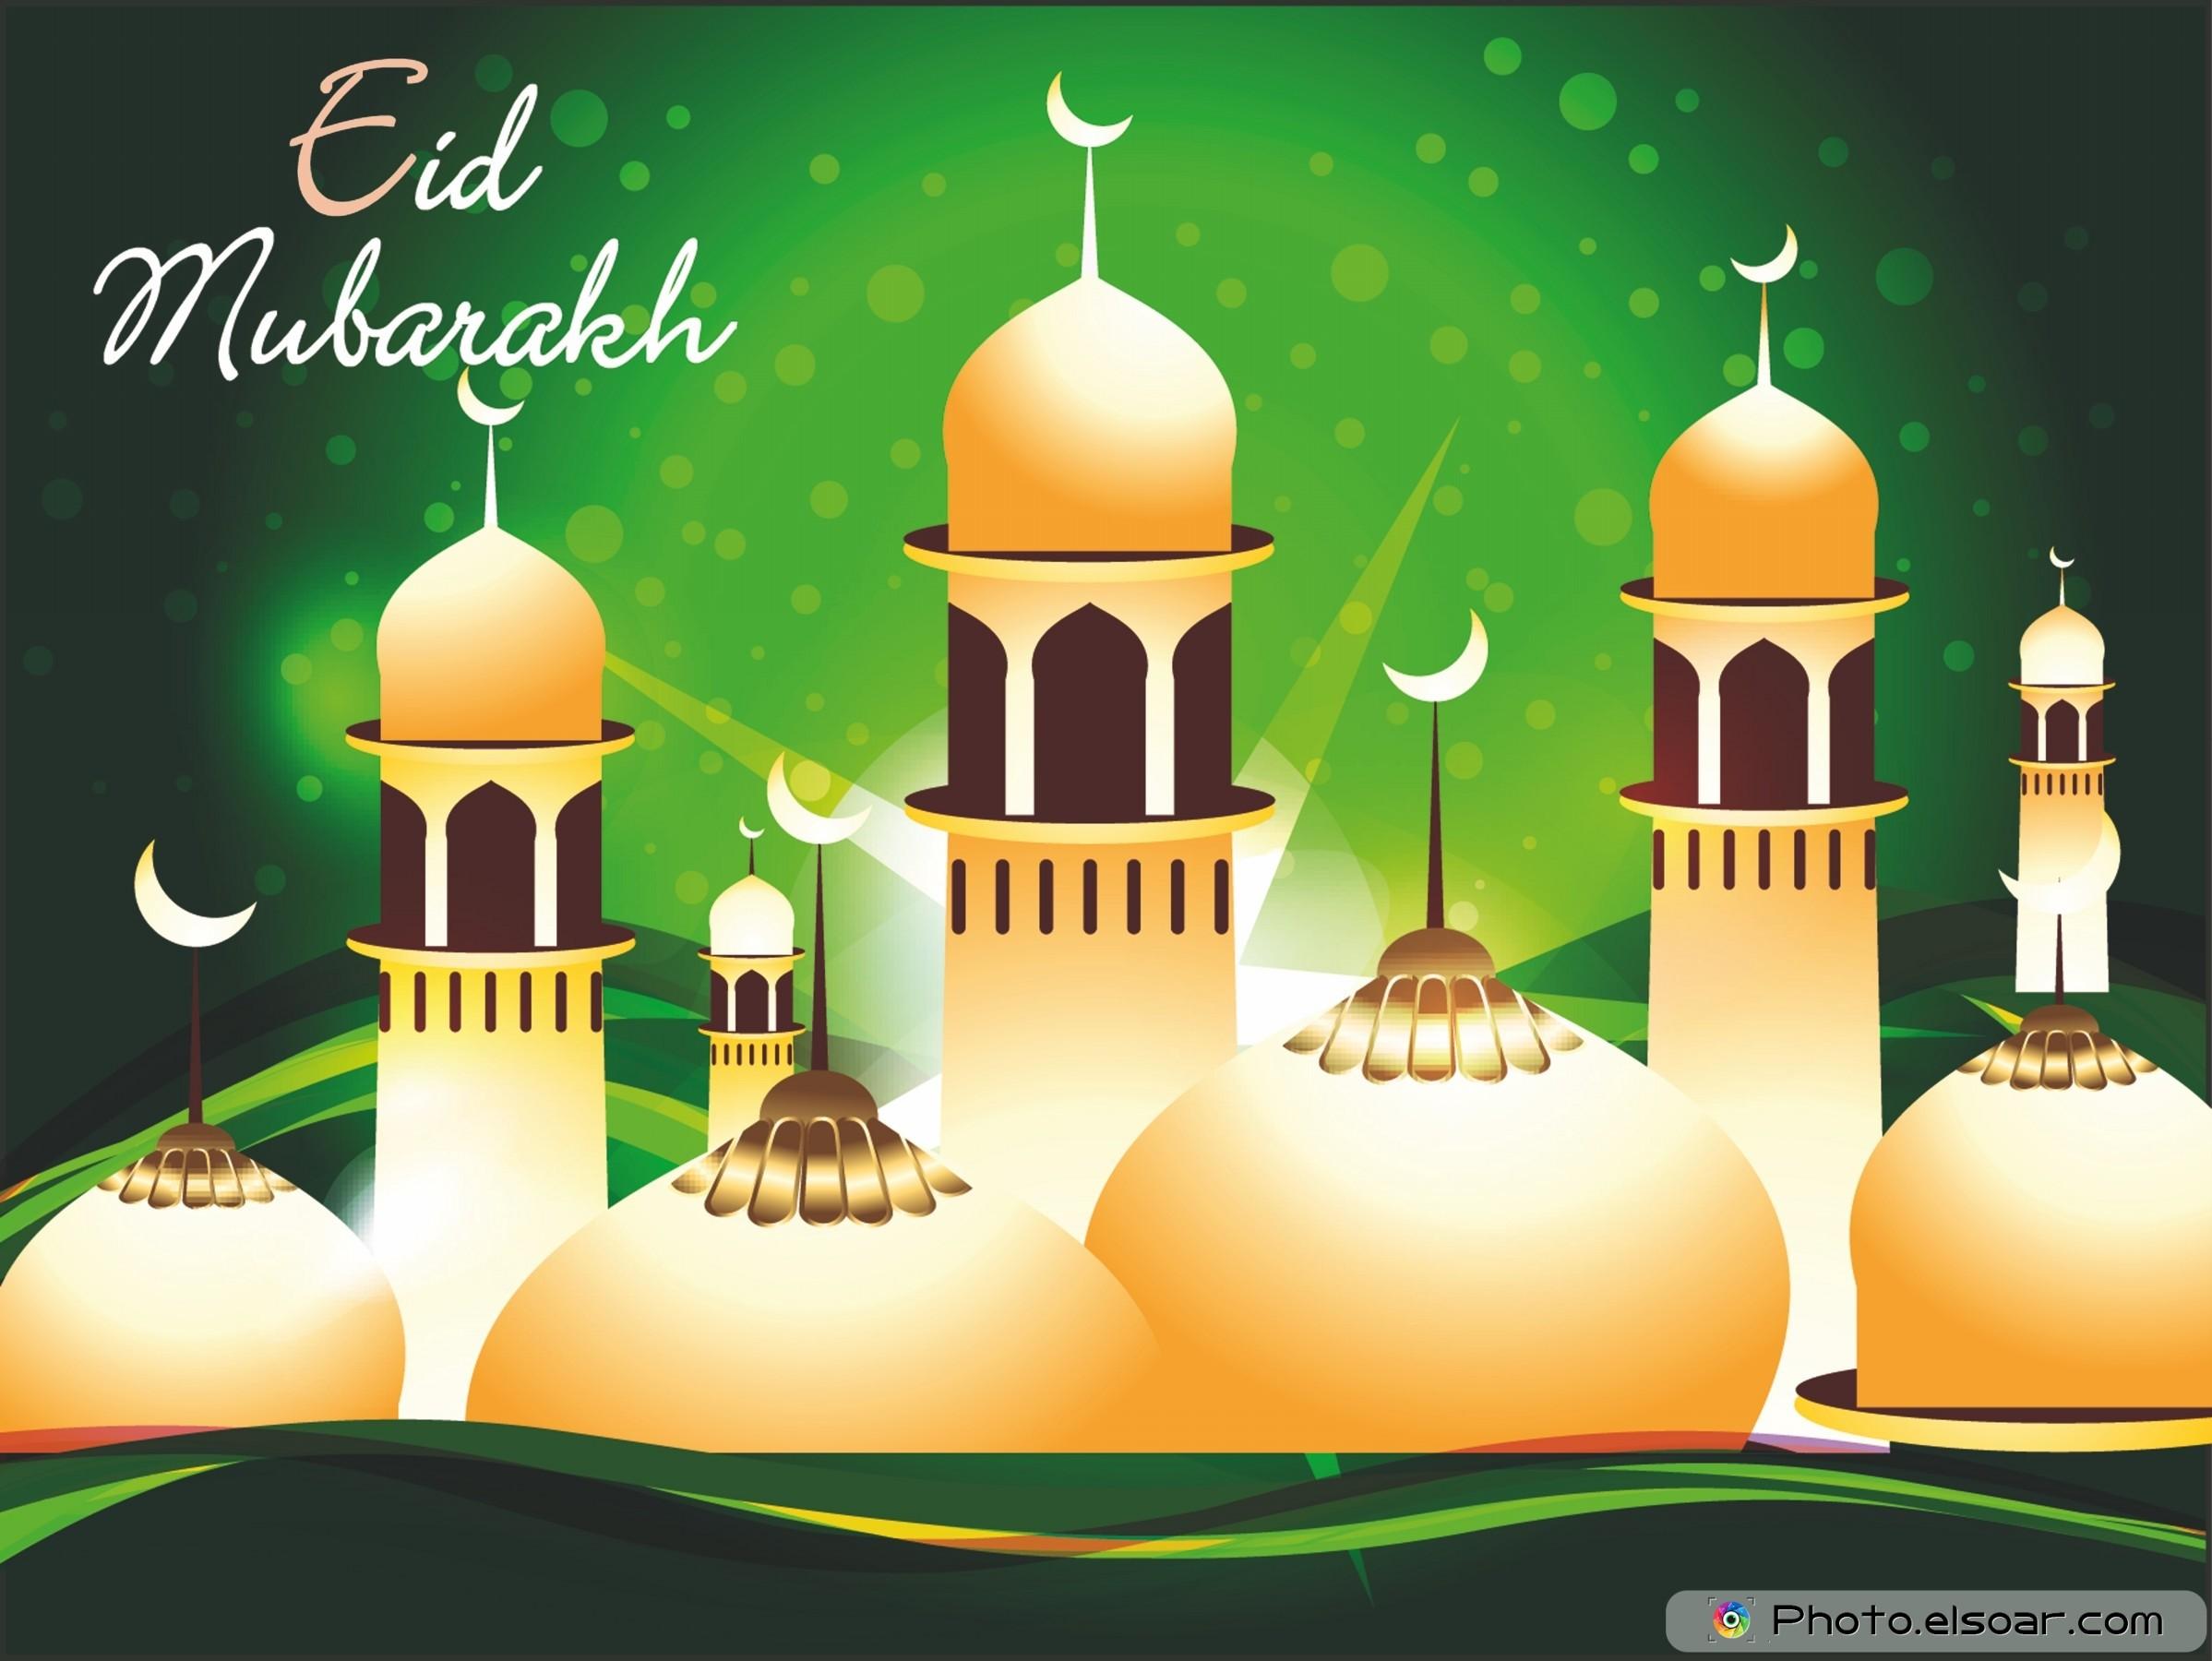 eid mubarak wallpapers (51+ images)